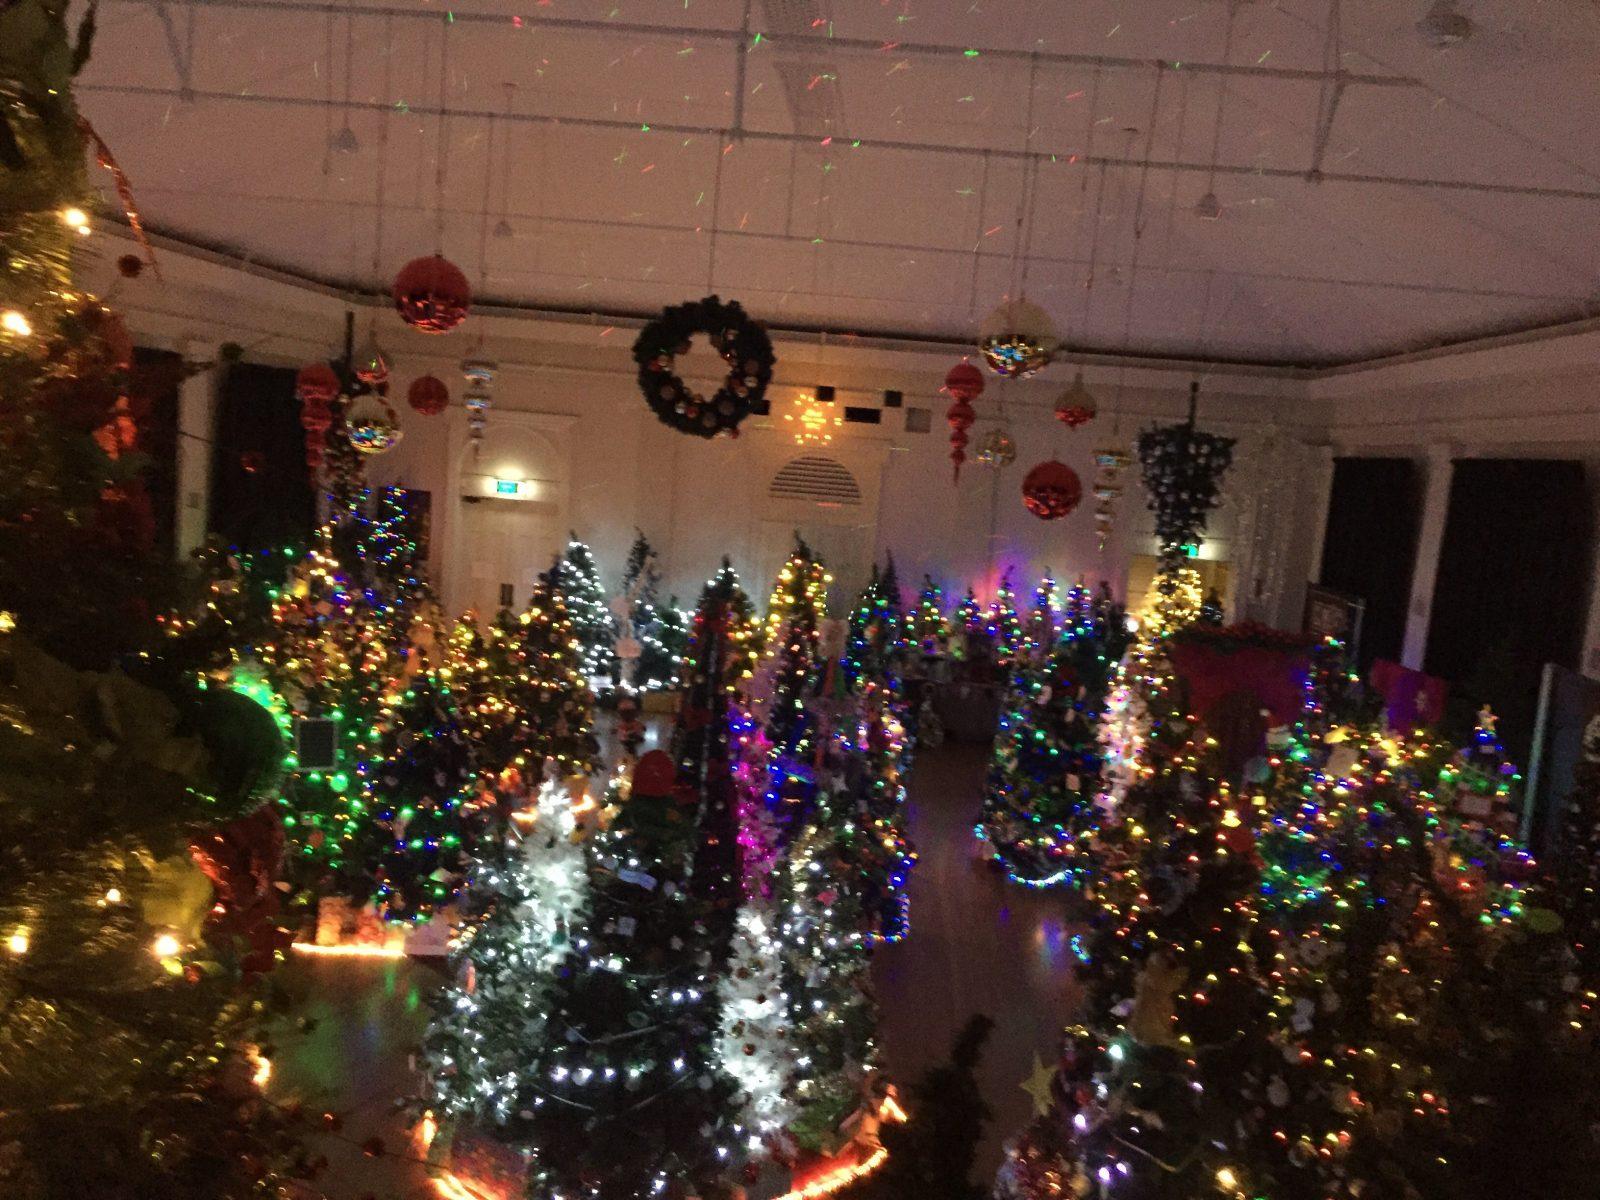 An amazing display of Xmas Trees